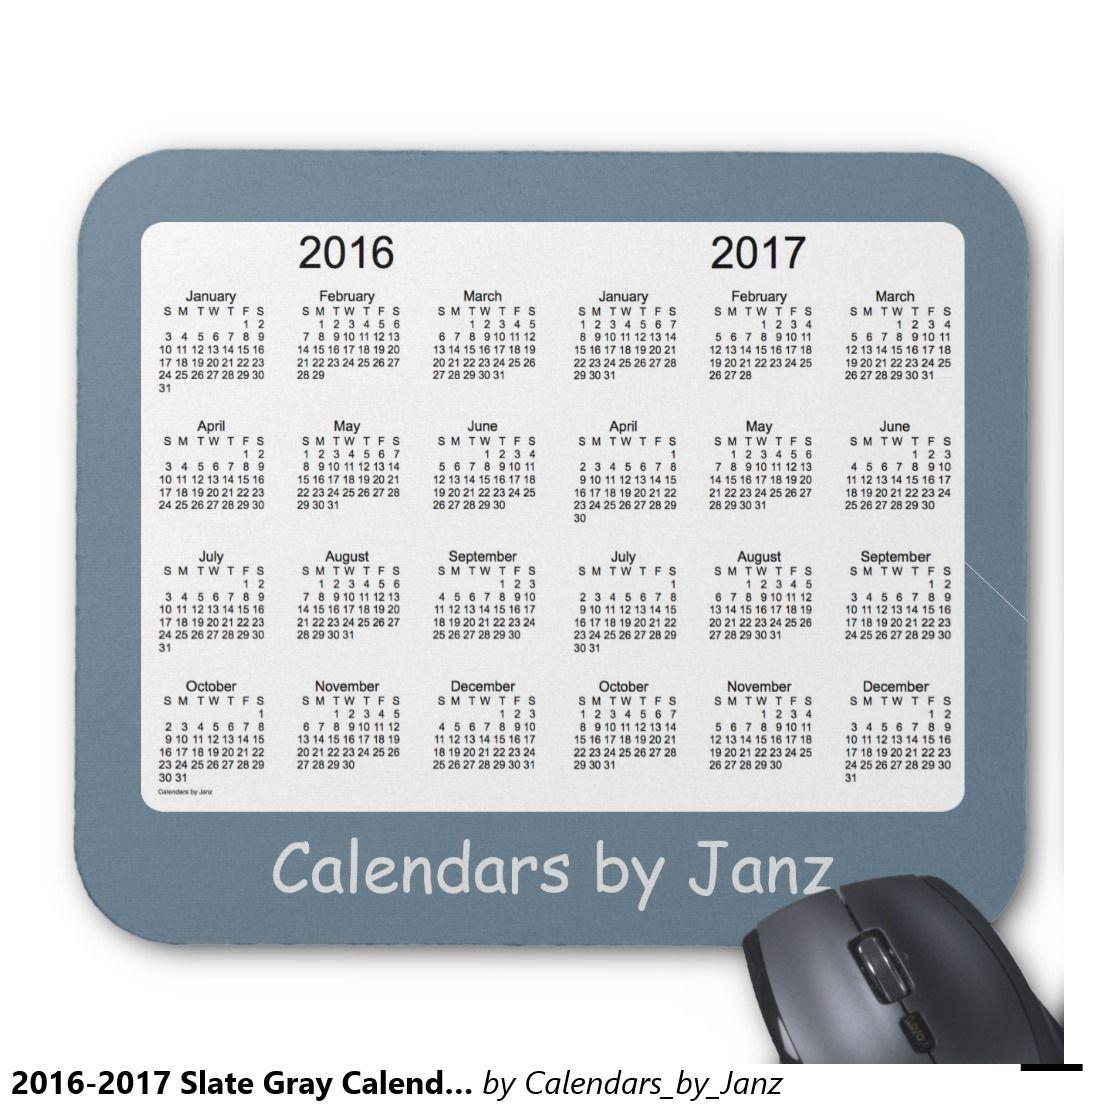 2016-2017 Slate Gray Calendar by Janz Mousepad